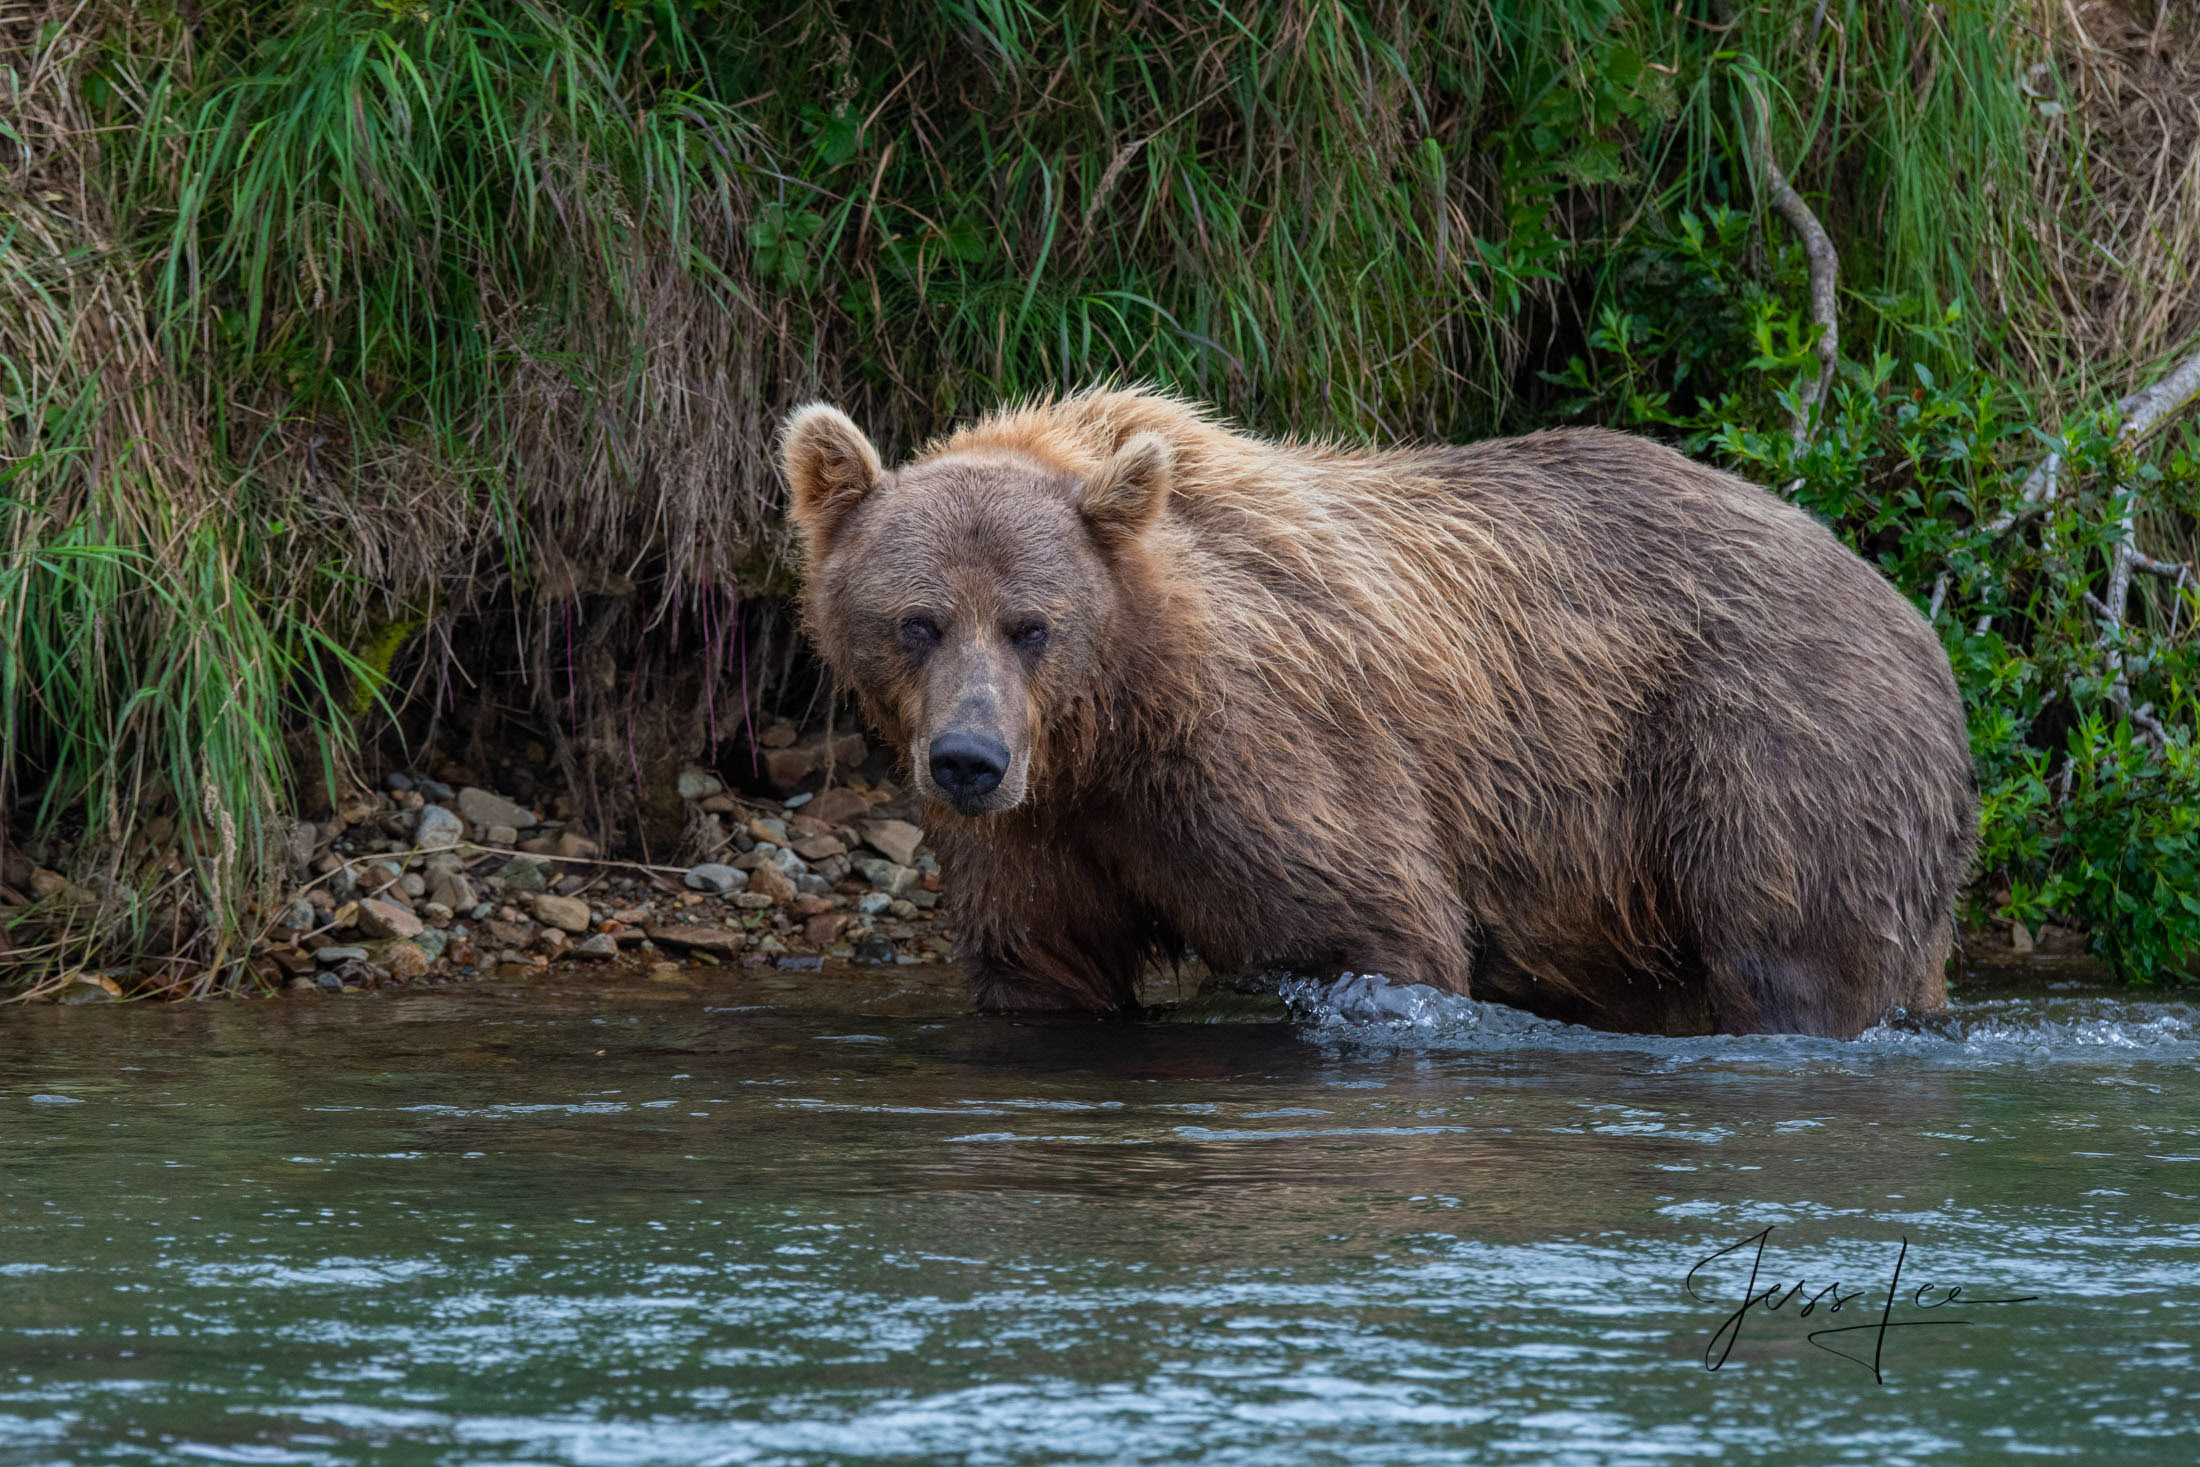 Katmai, Bear, grizzle, fishing, salmon, , Grizzly grizzlies, Brown Bear, Picture, Print, photo